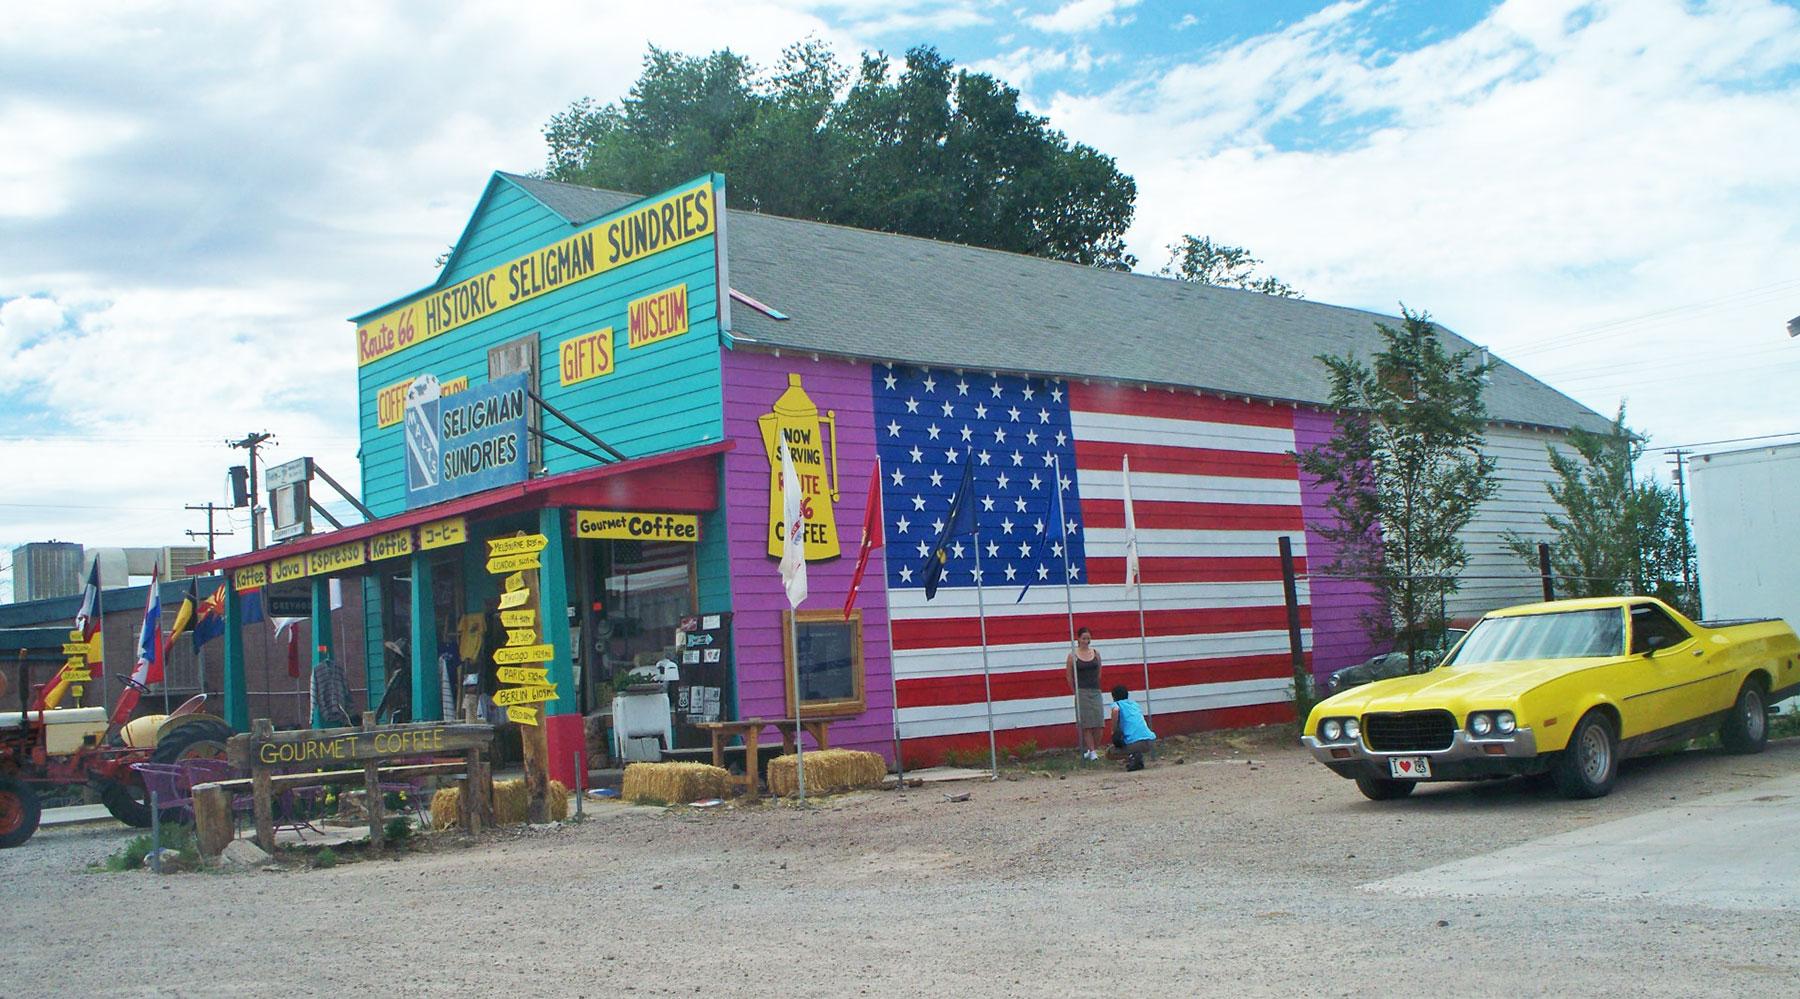 Seligman_sundries, route 66, États-Unis, Chinook voyage, aventure,